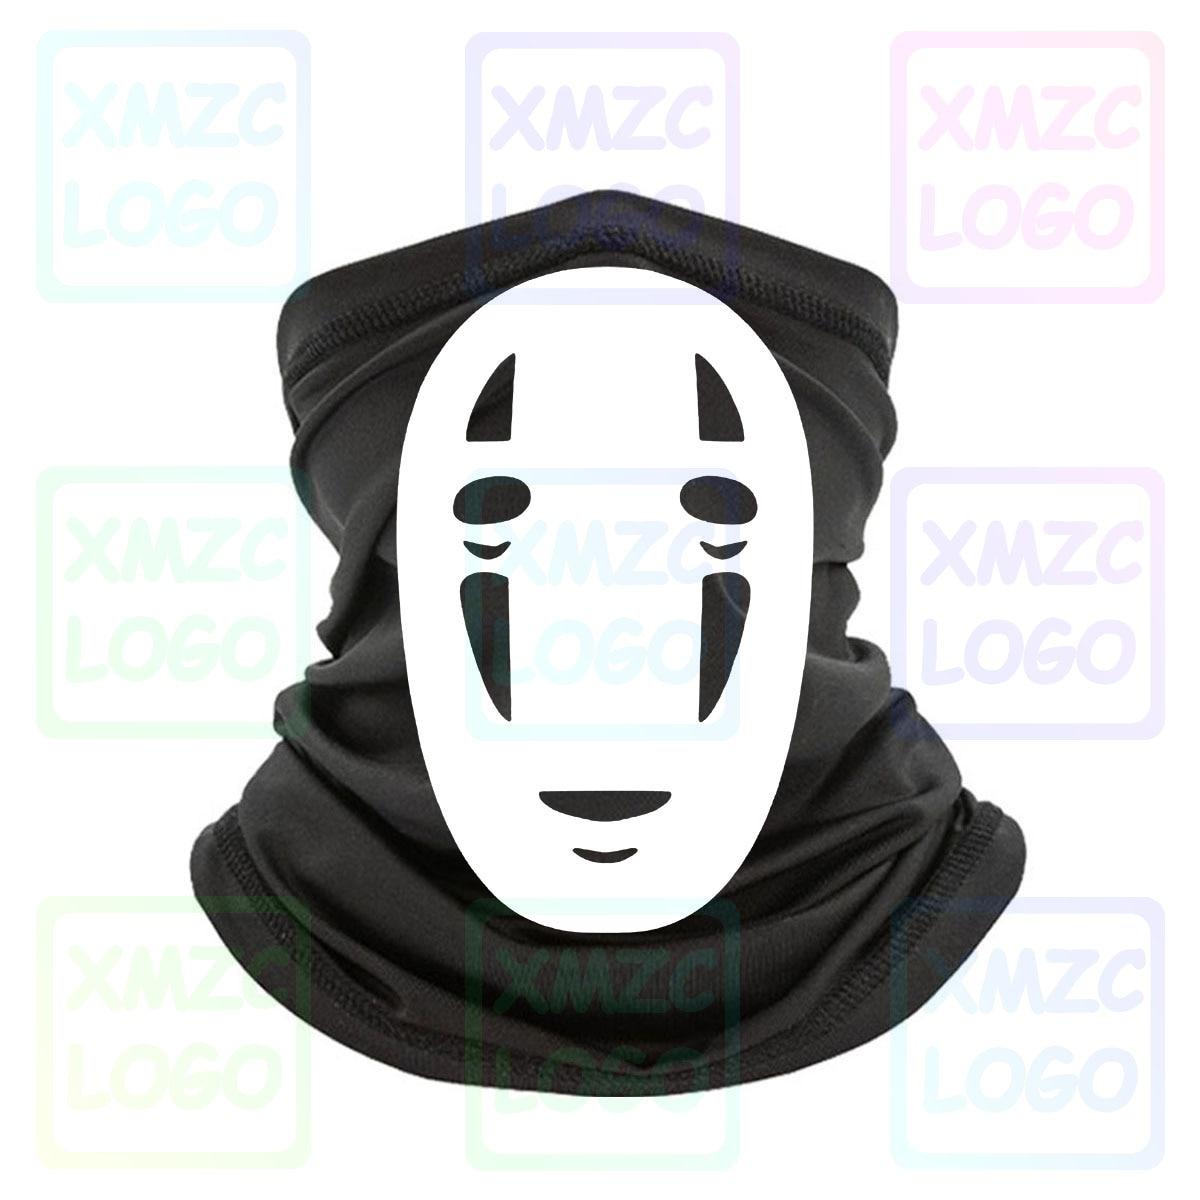 Verano de 2018 marca famosa disección Finis Omnium oficial Bandana, S, M, L, Xl negro la muerte de Bandana algodón pañuelos libre Sh